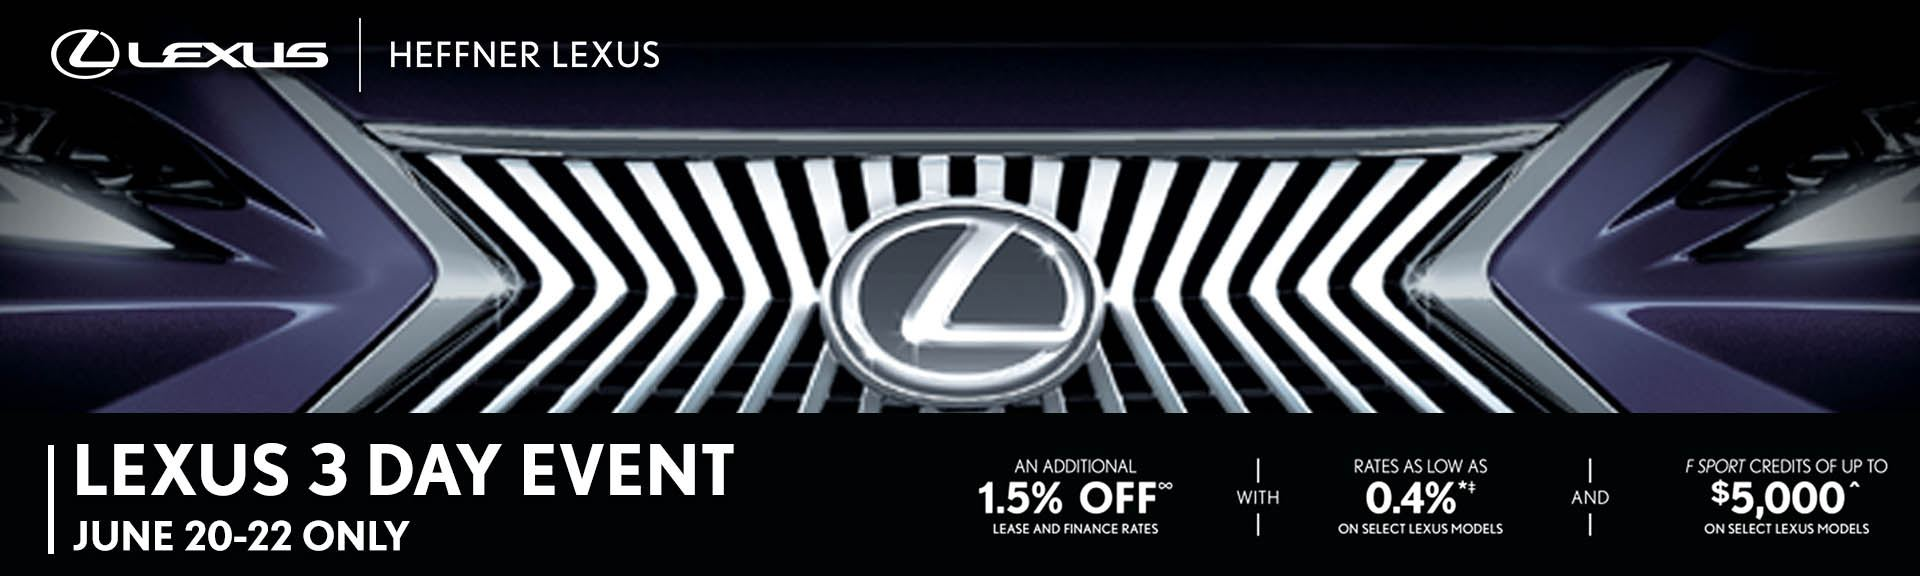 Lexus 3 Day Event at Heffner Lexus, June 20-22 only